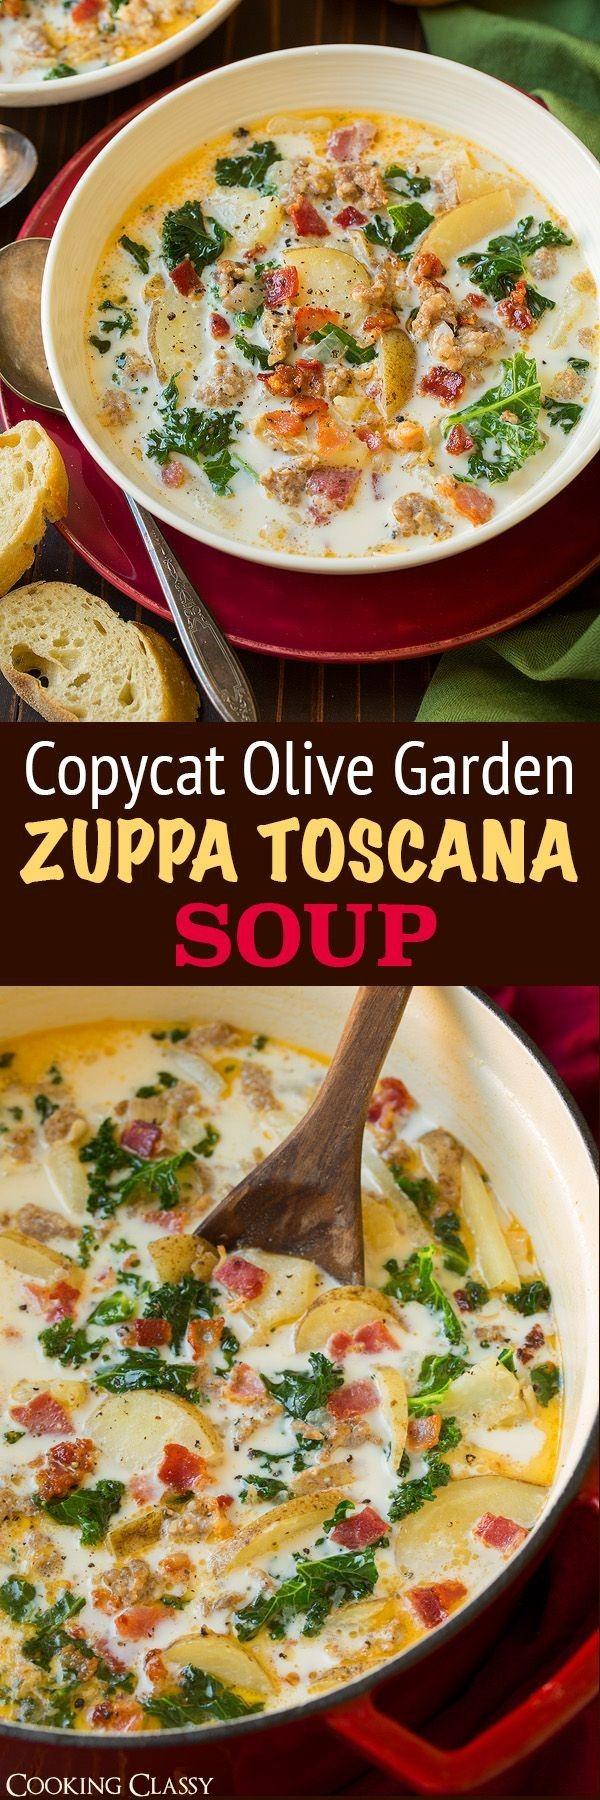 Zuppa Toscana Soup (Olive Garden Copycat) | Monte Cristo sandwich ...